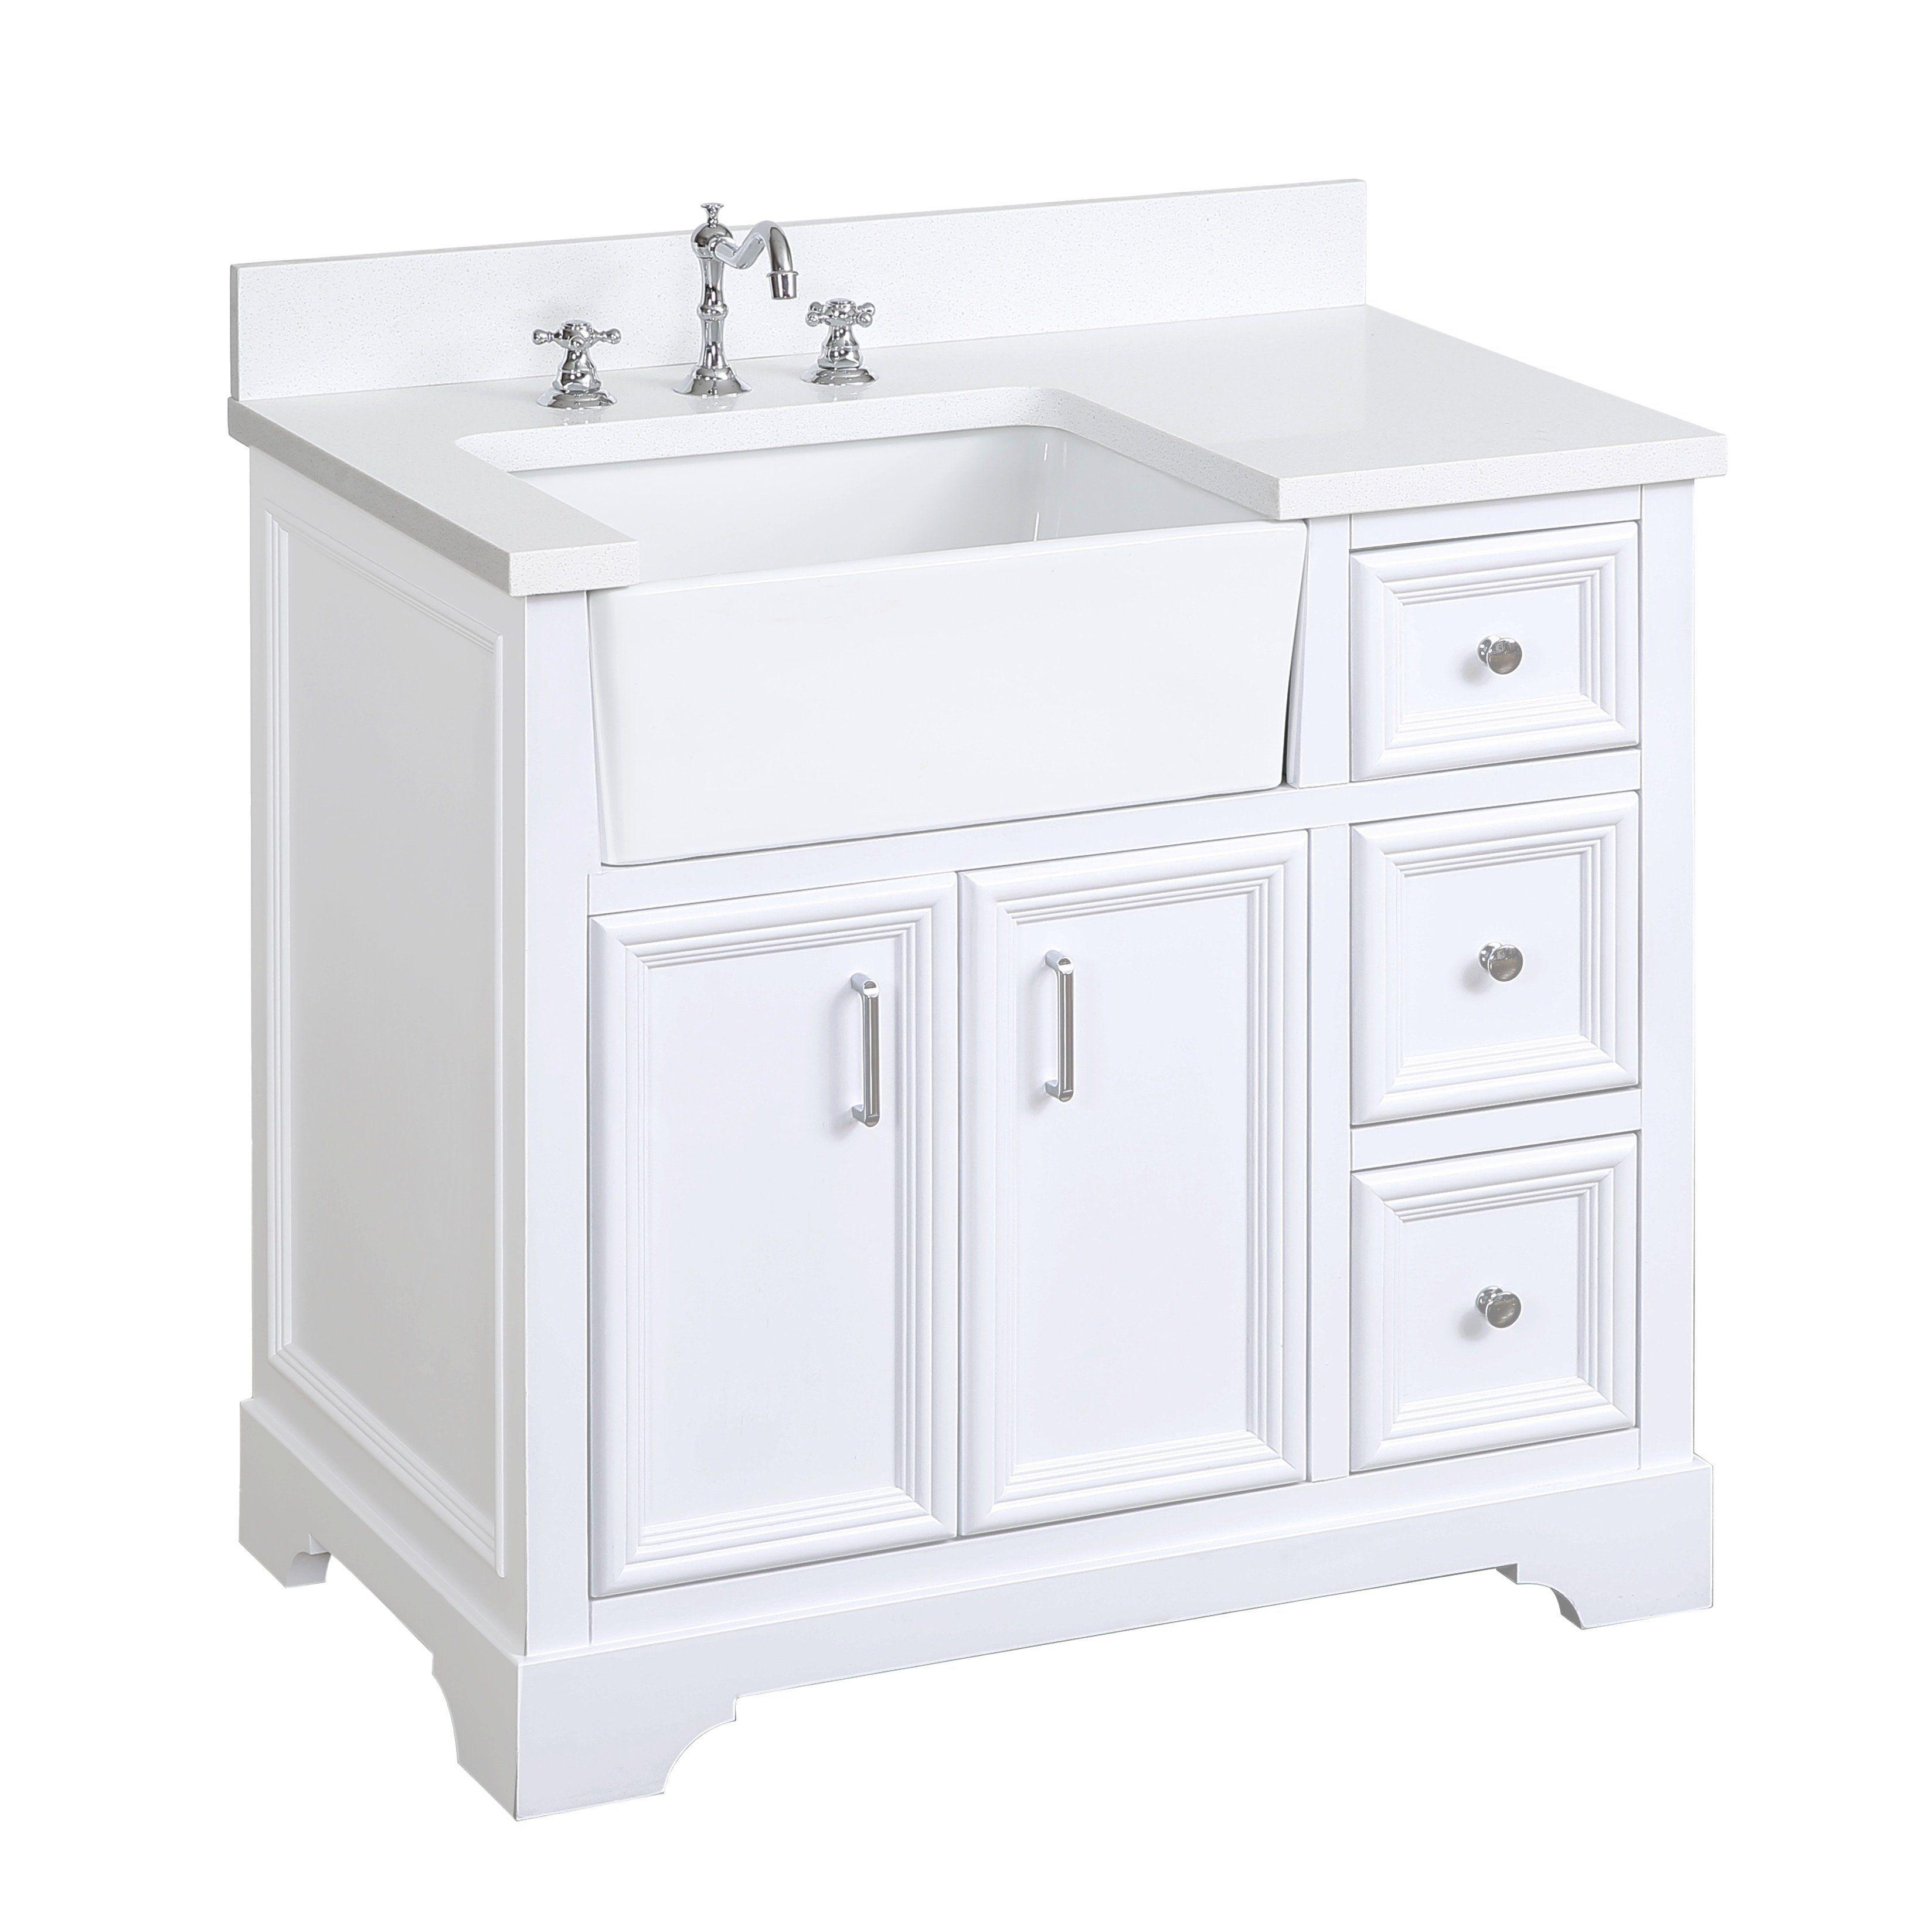 Zelda 36 Inch Farmhouse Vanity With Quartz Top Single Bathroom Vanity Farmhouse Vanity Vanity [ 3296 x 3296 Pixel ]